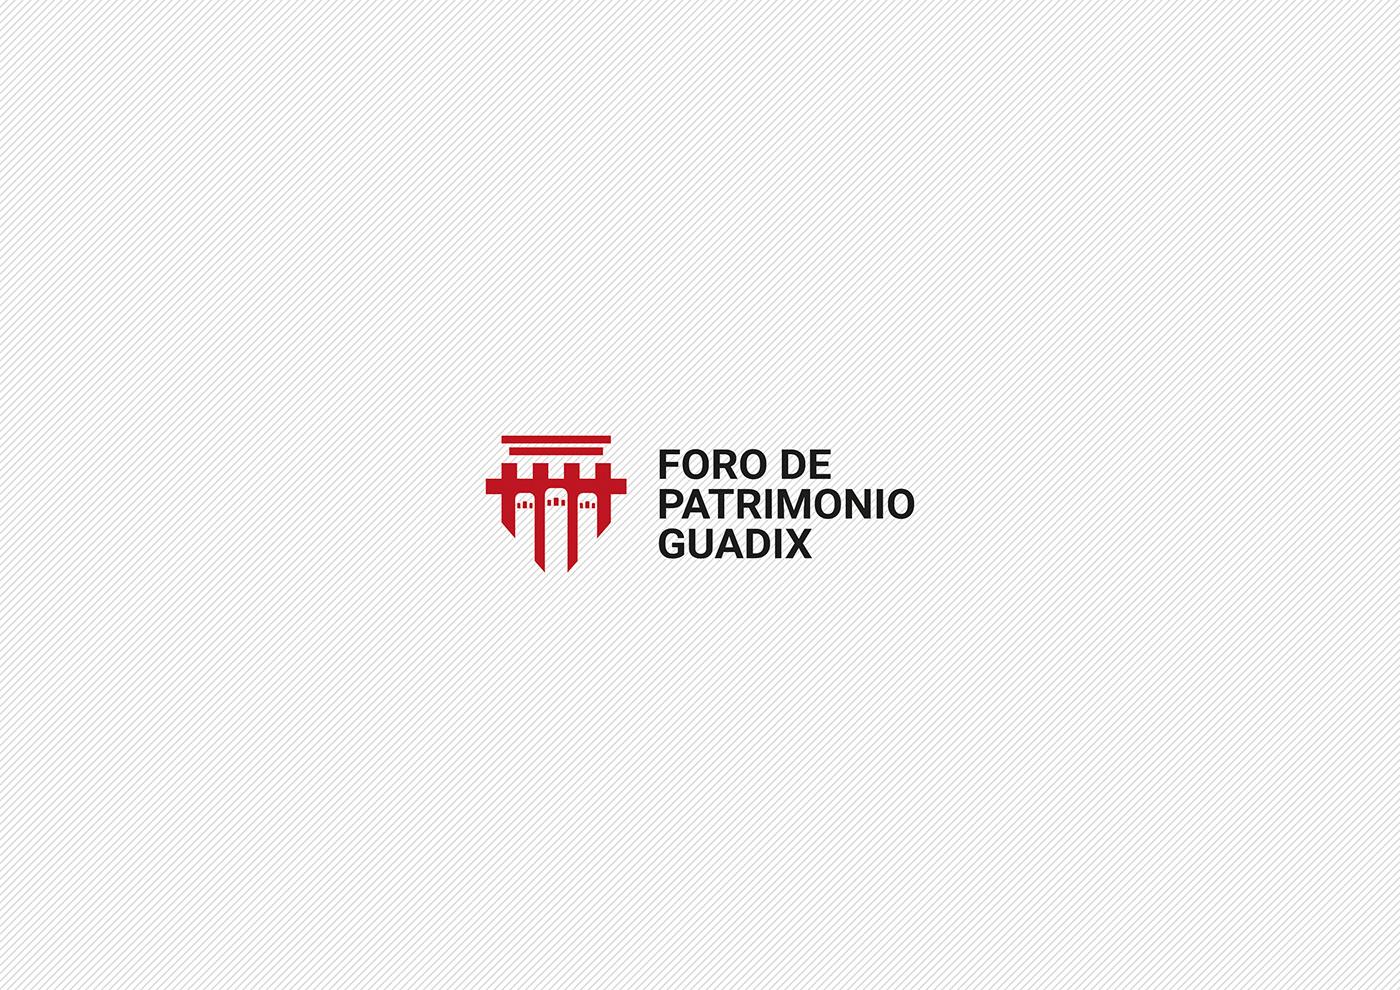 Logotipo logo Identidad Corporativa identidad patrimonio guadix branding  brand